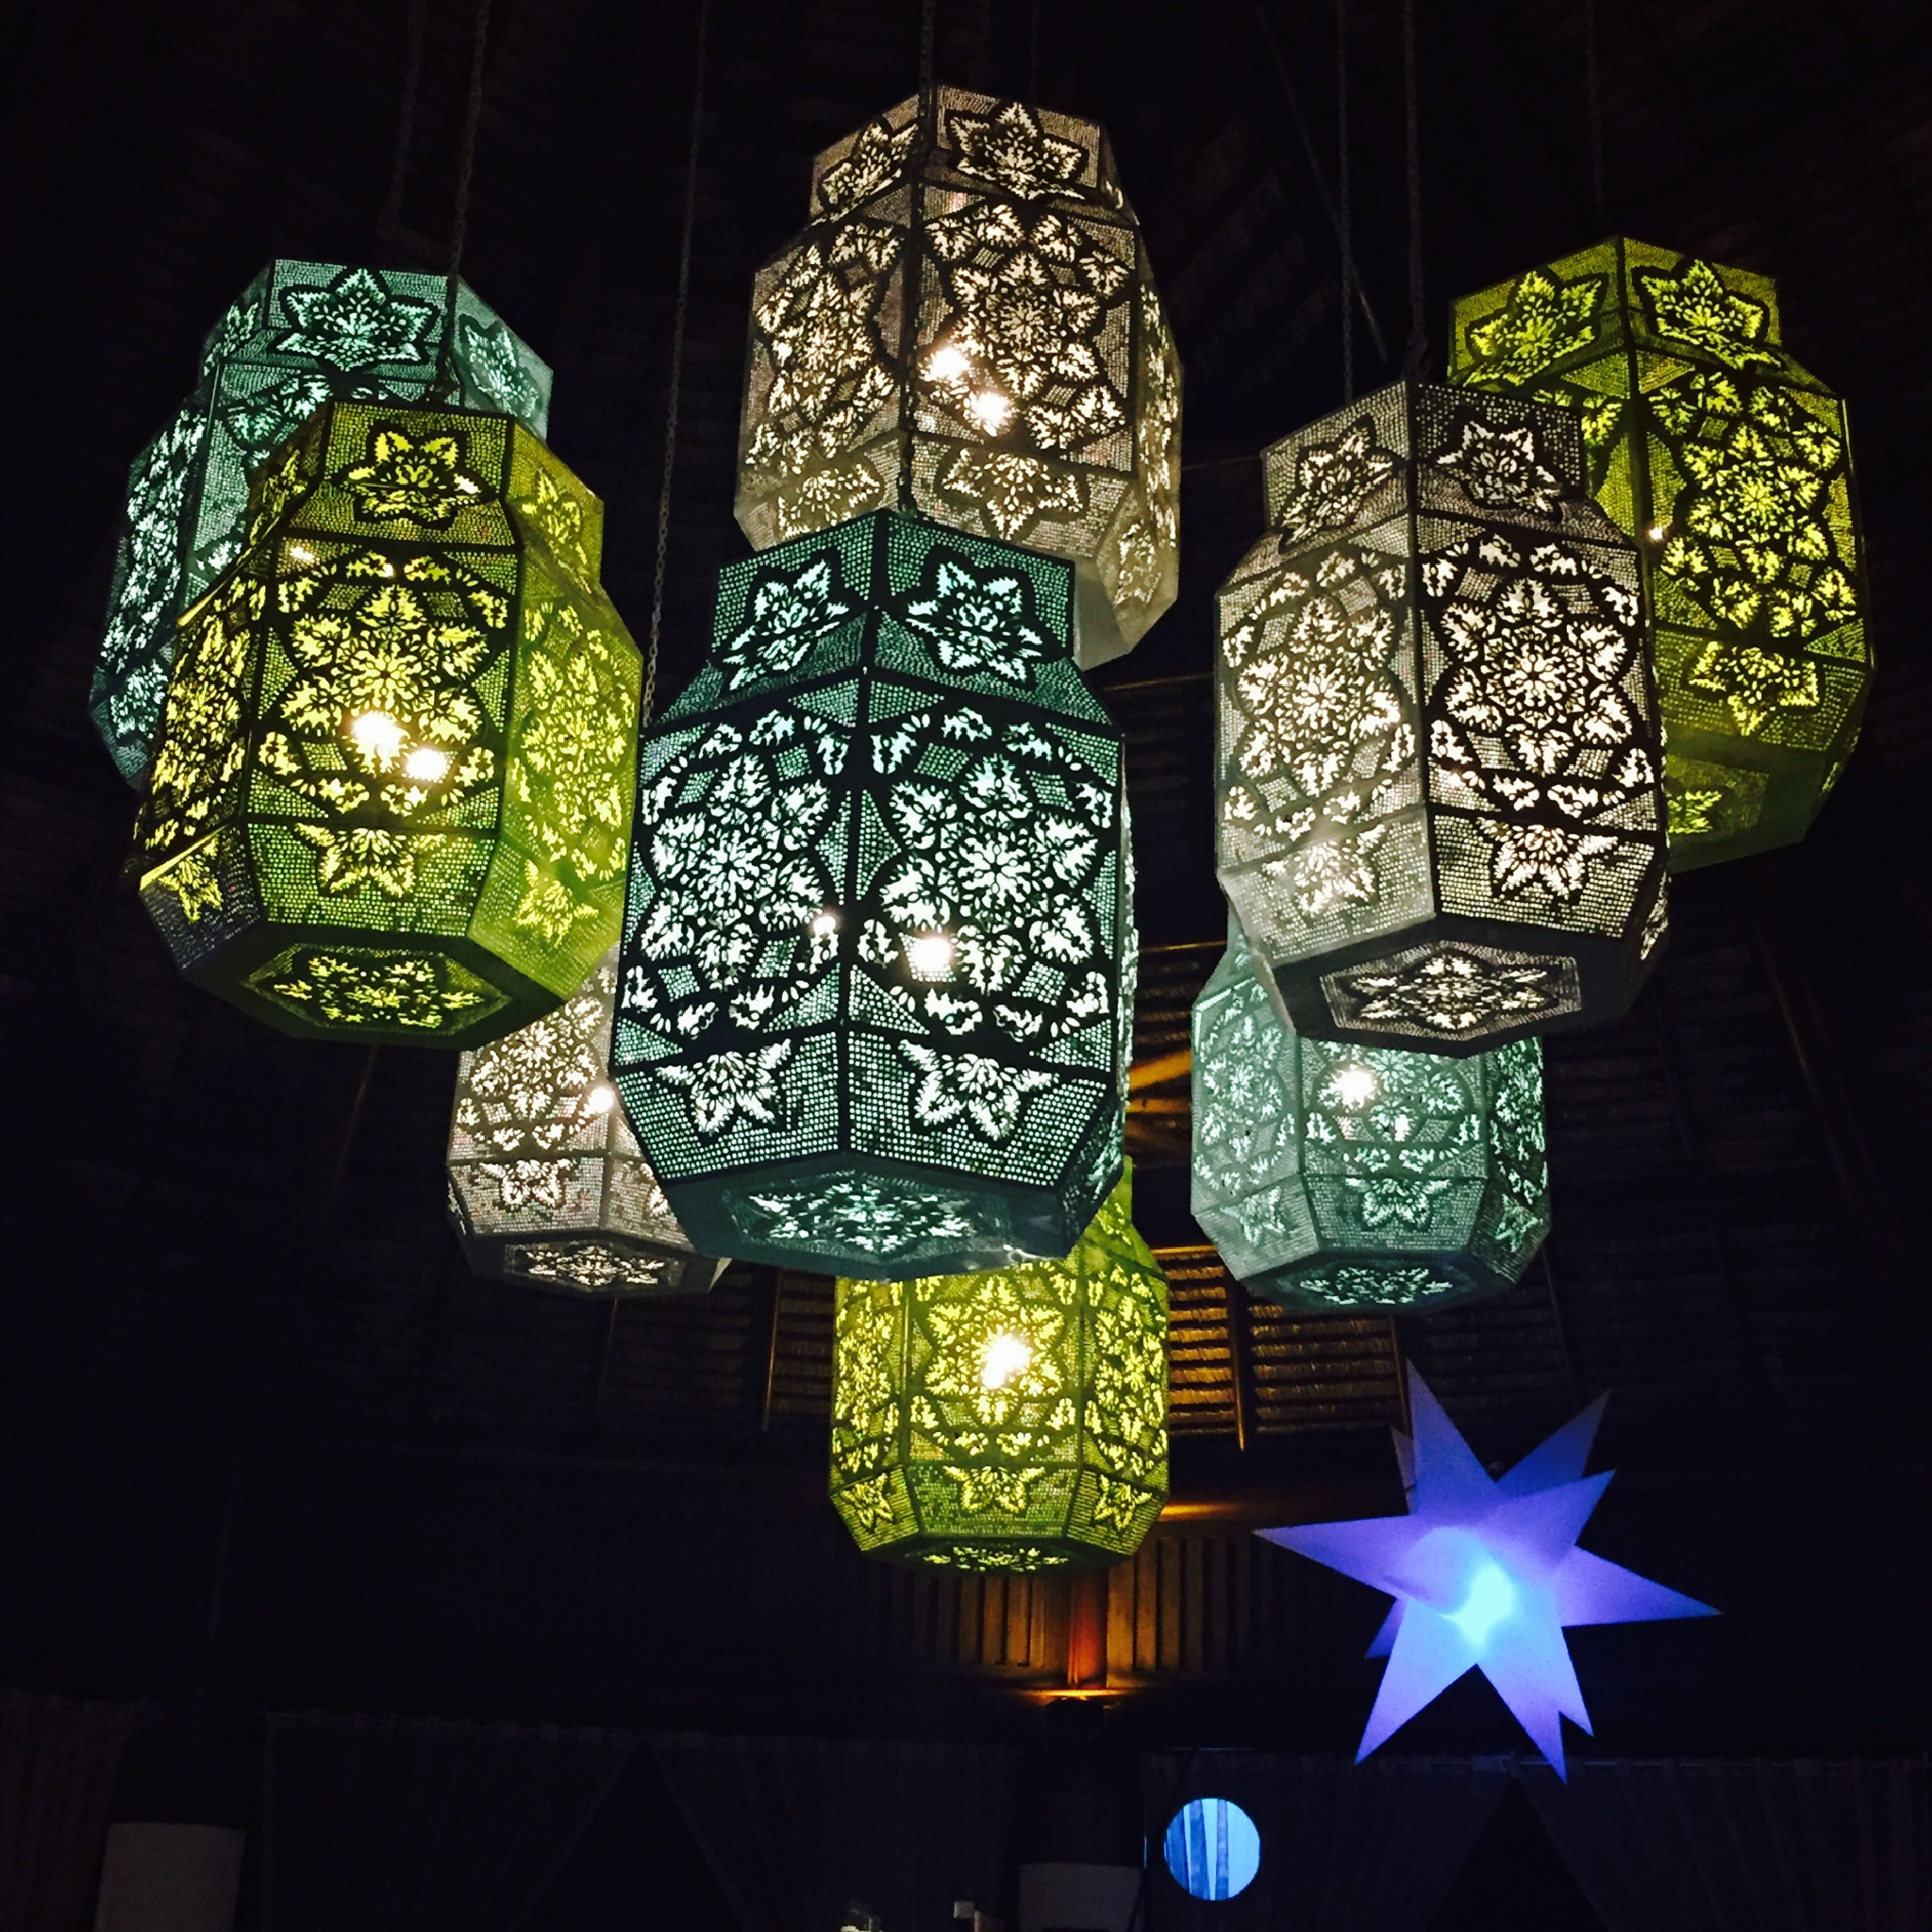 Lamps  by Manuel Villanueva